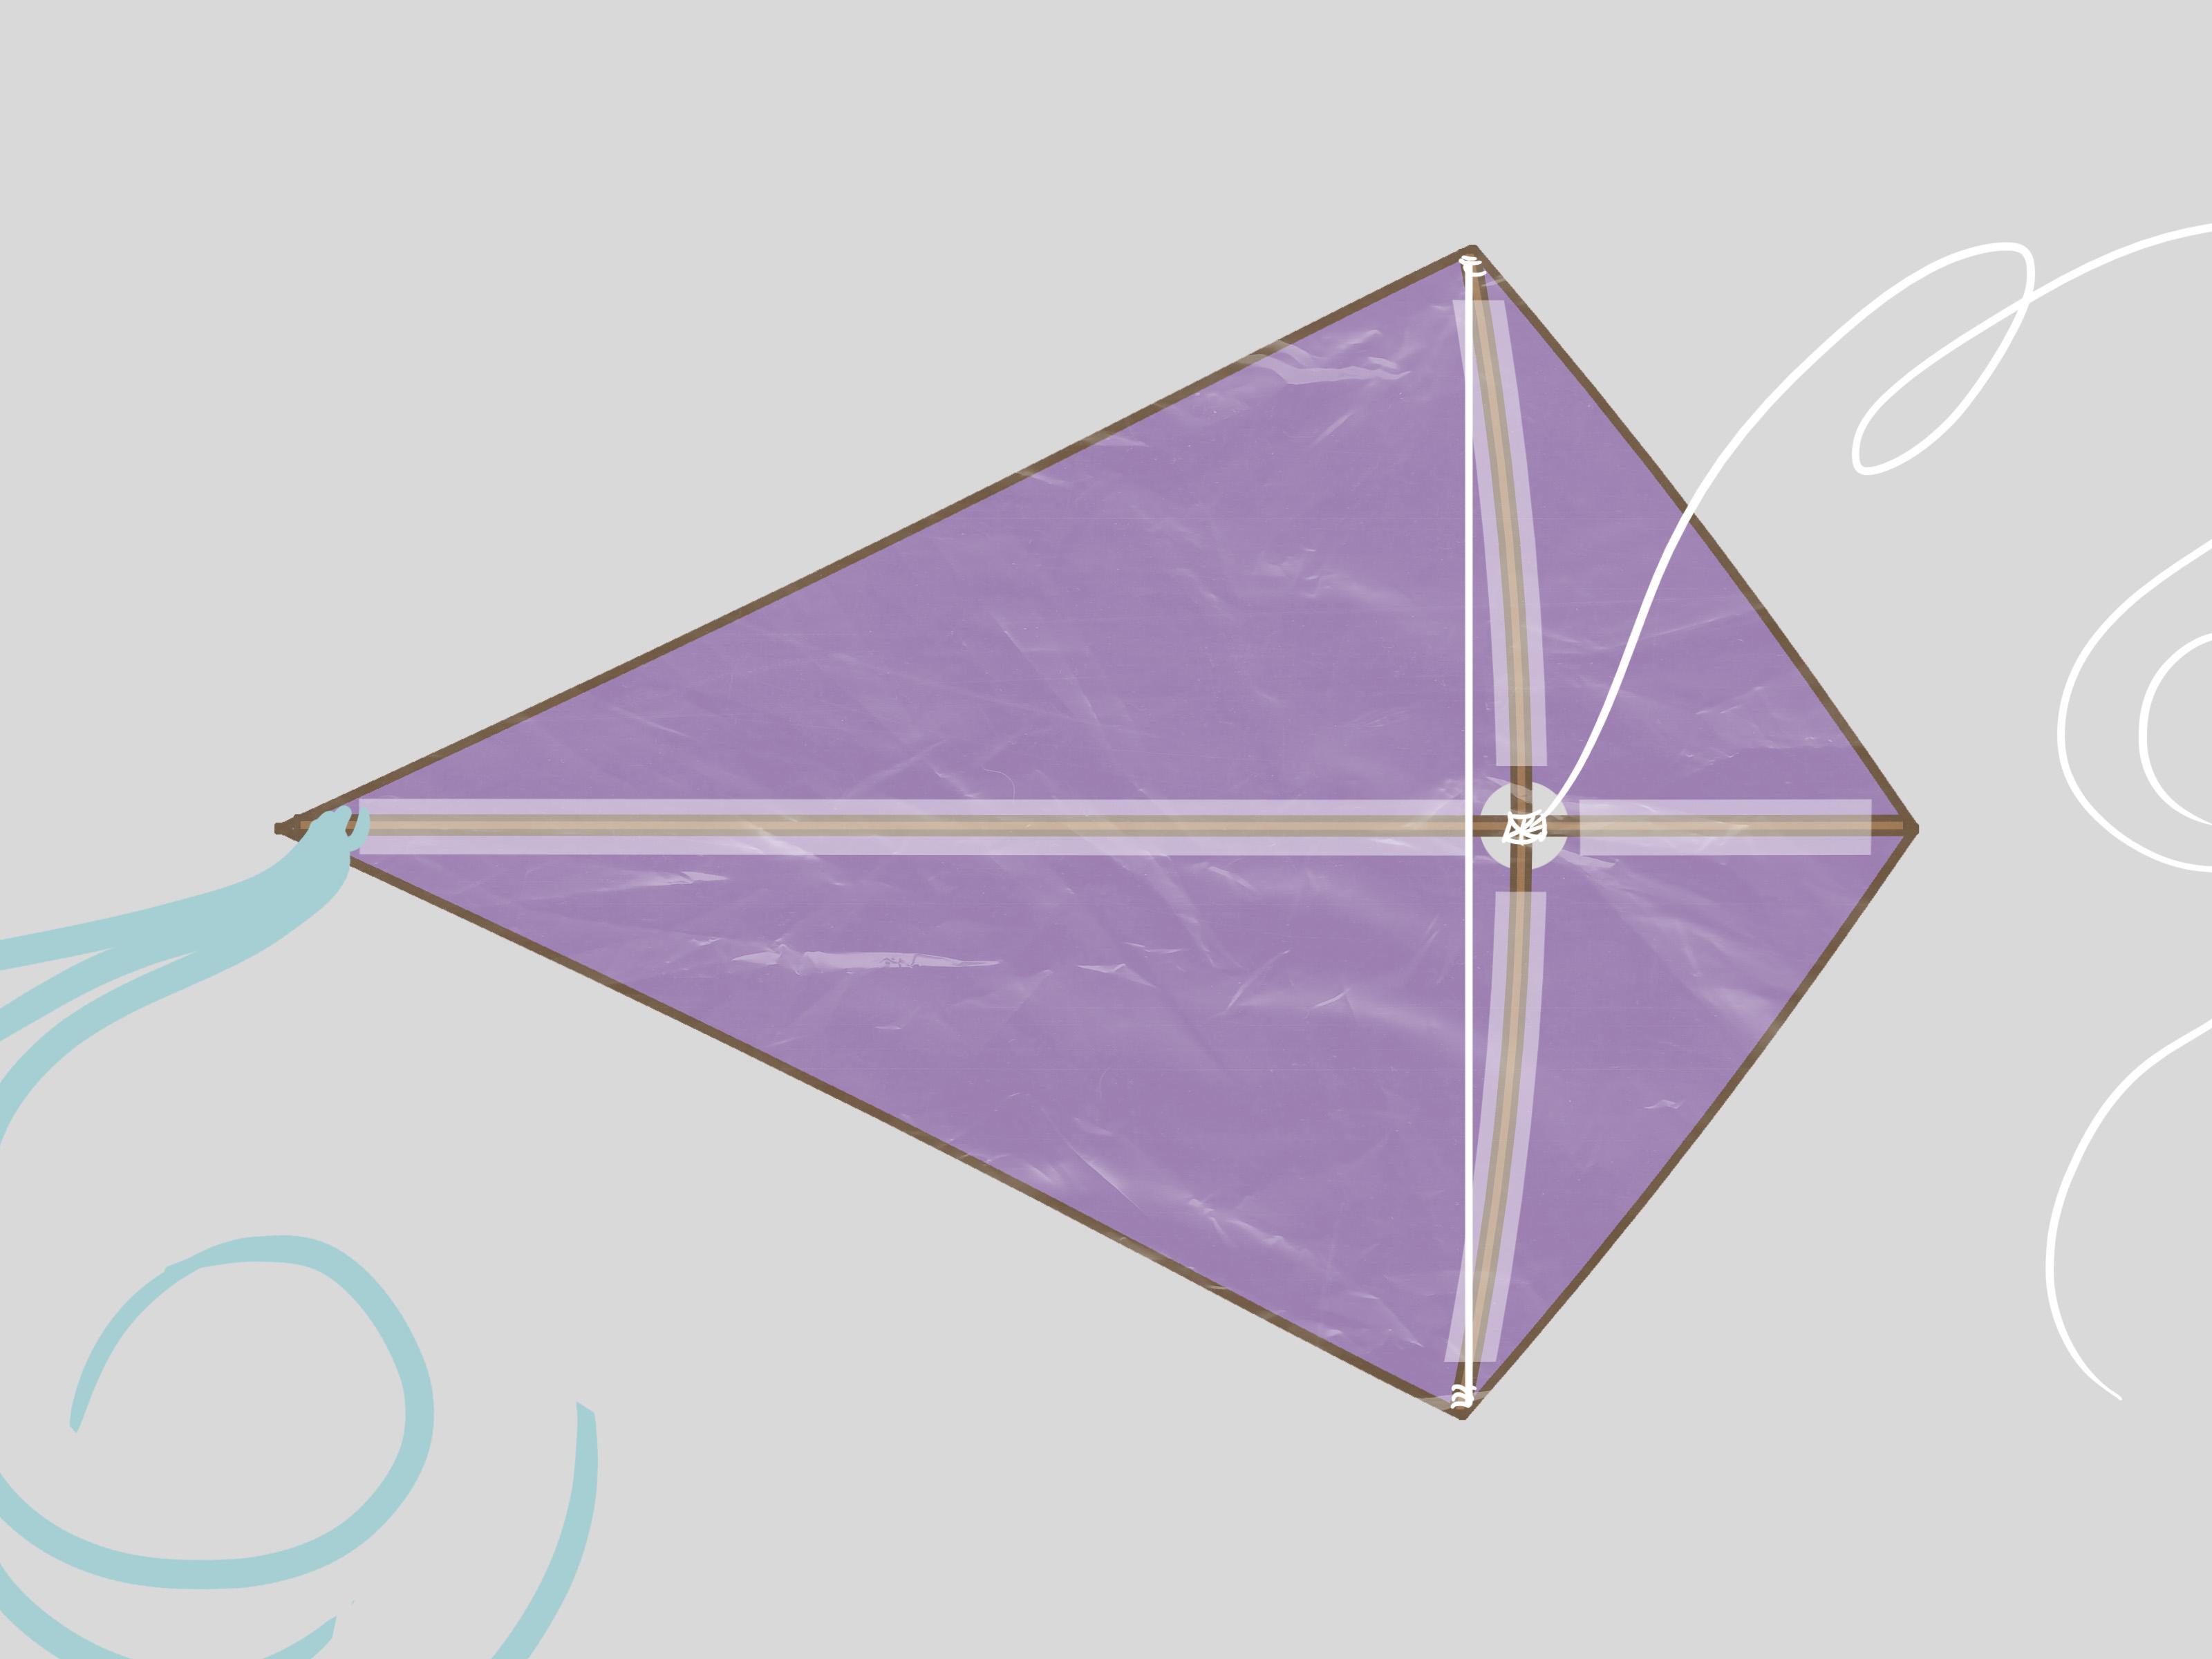 4 Fun Ways To Make A Simple Kite